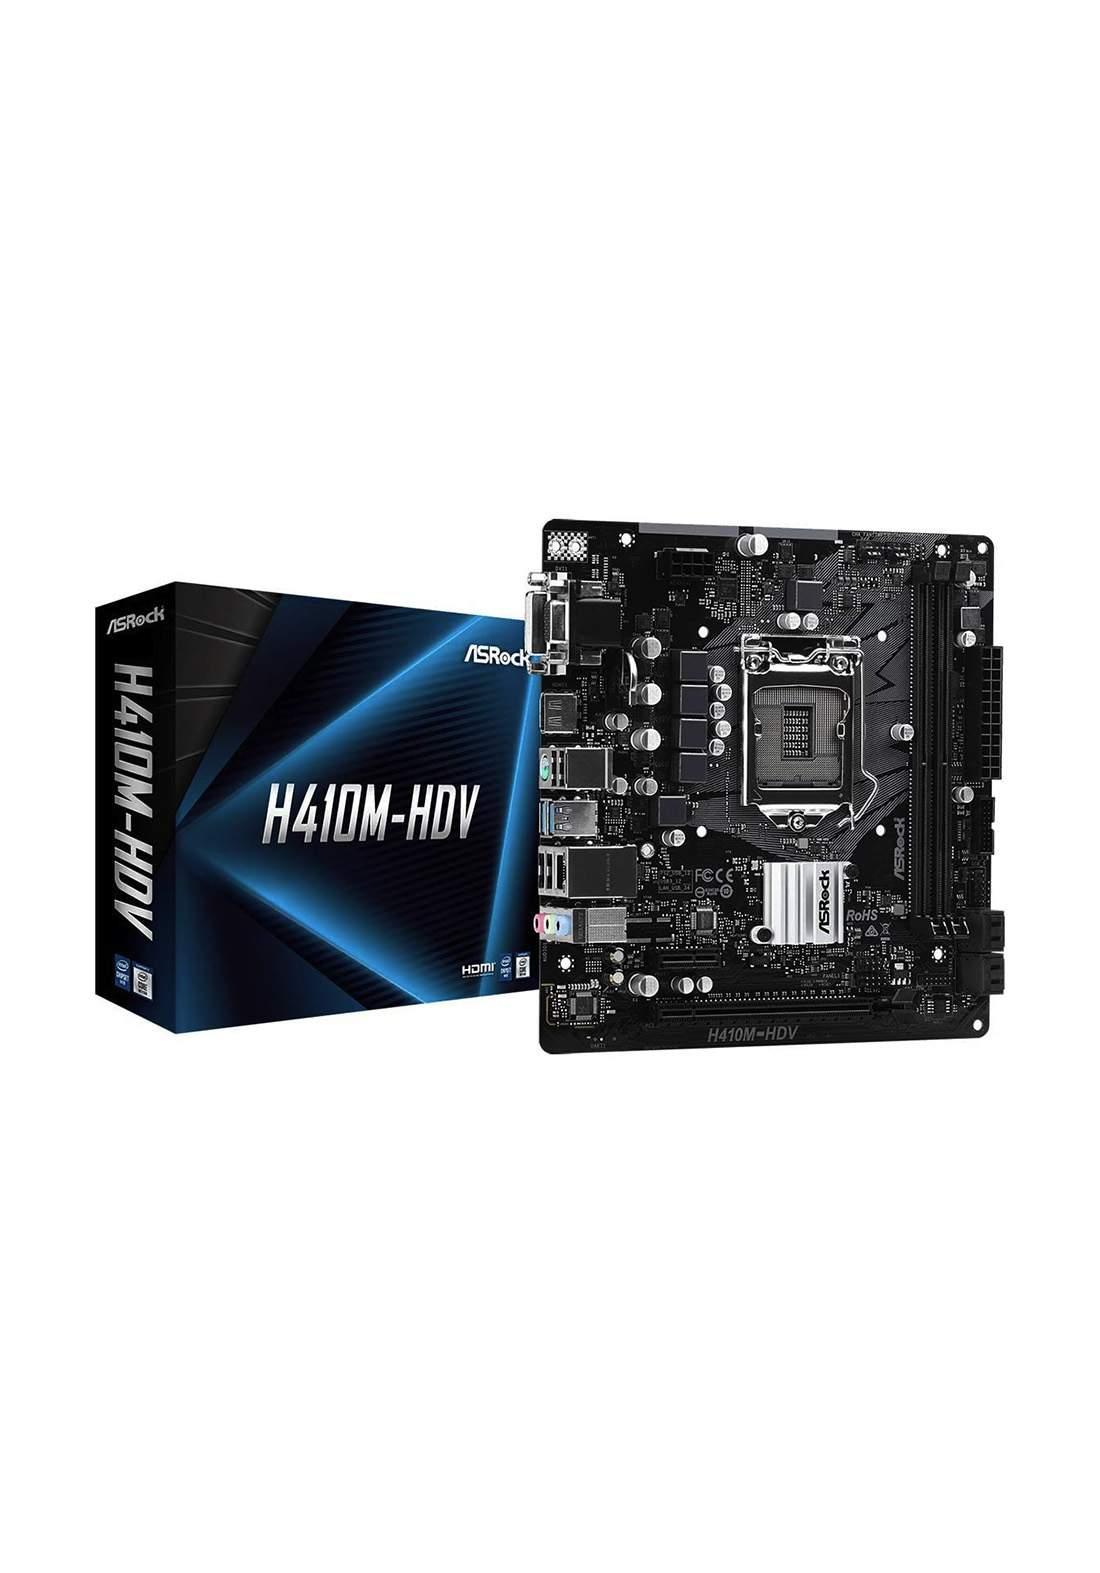 ASRock H410M-HDV 10th Gen DDR4 Motherboard - Black لوحة الام